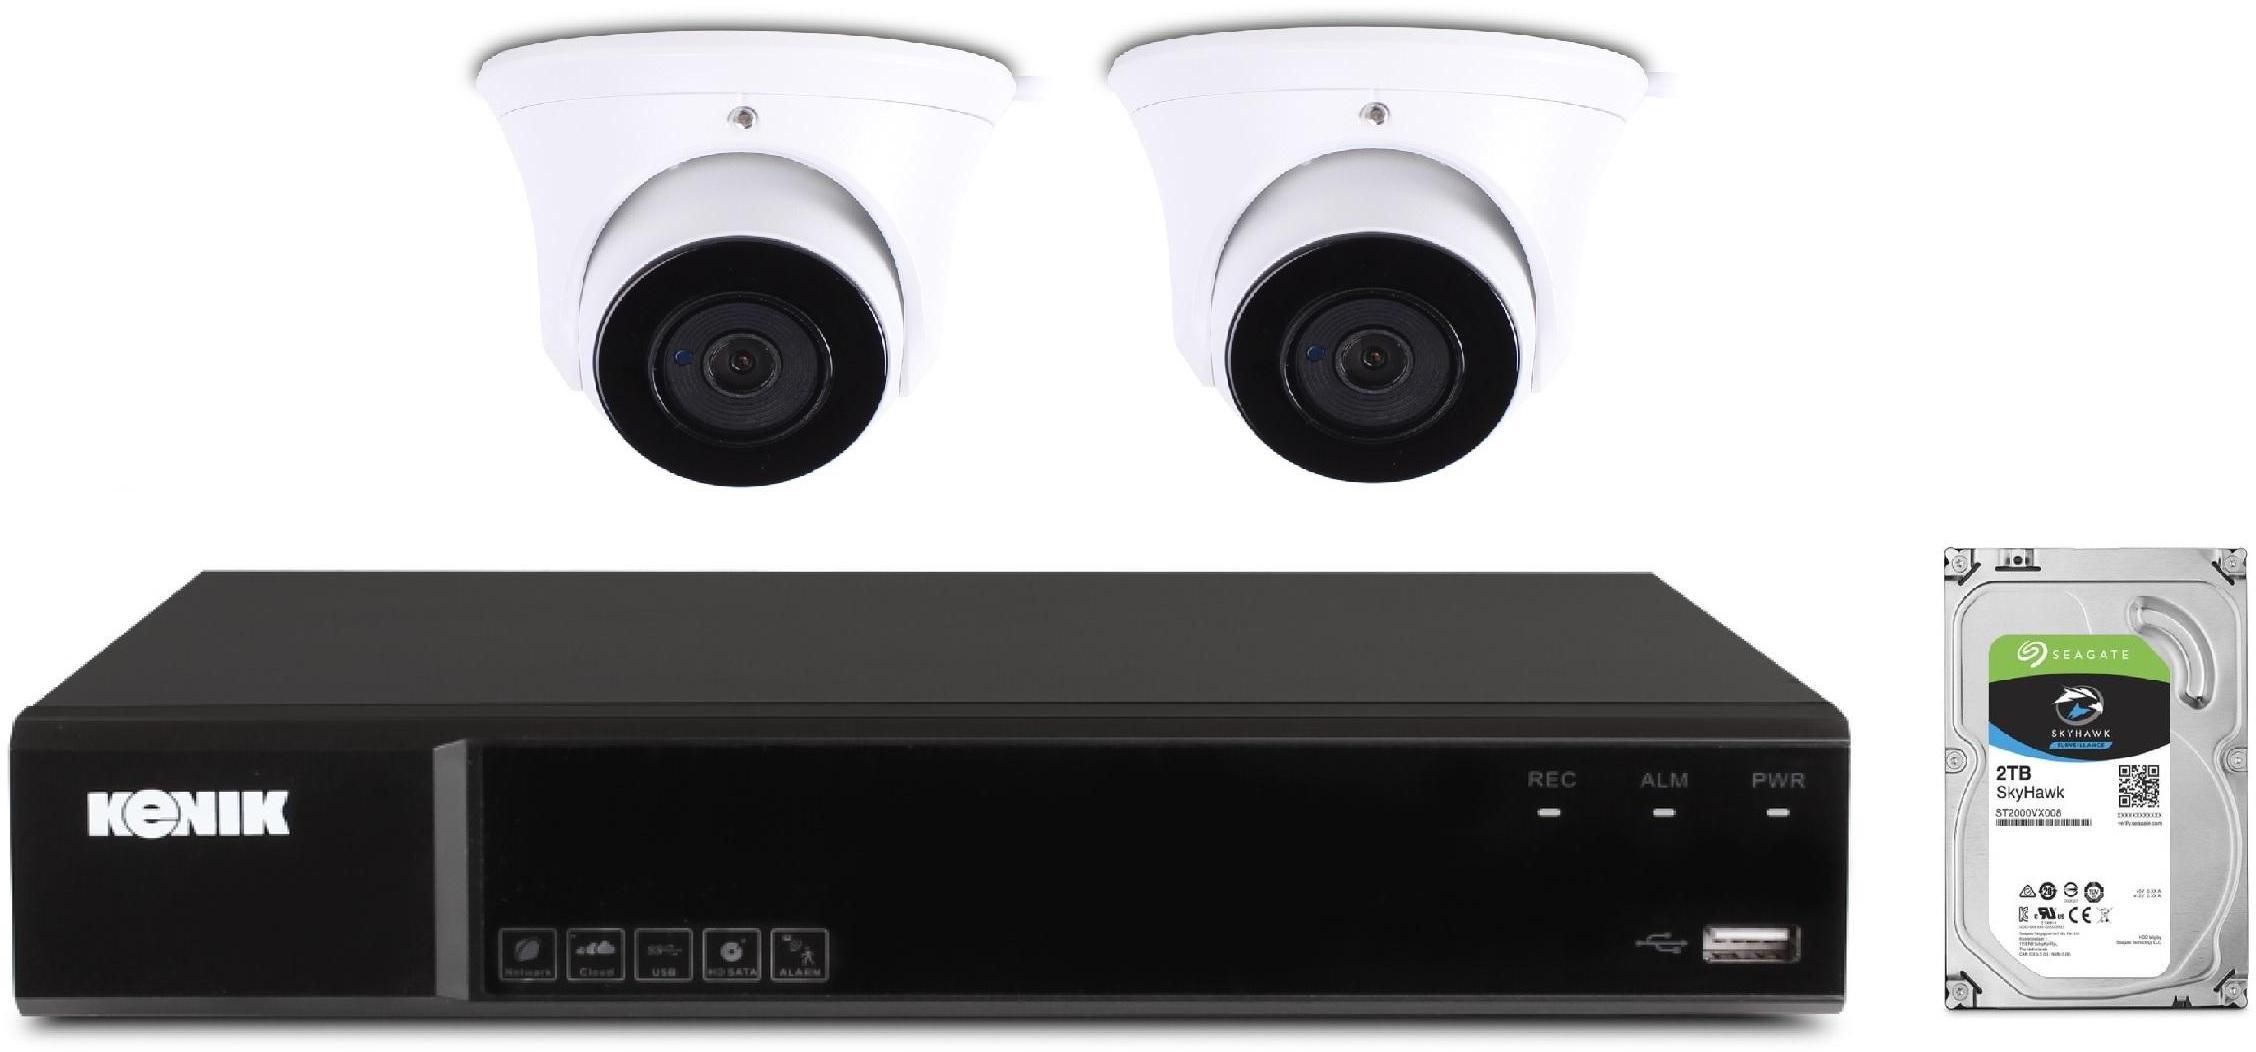 Zestaw monitoringu domu Kenik 2 kamery 2mpx